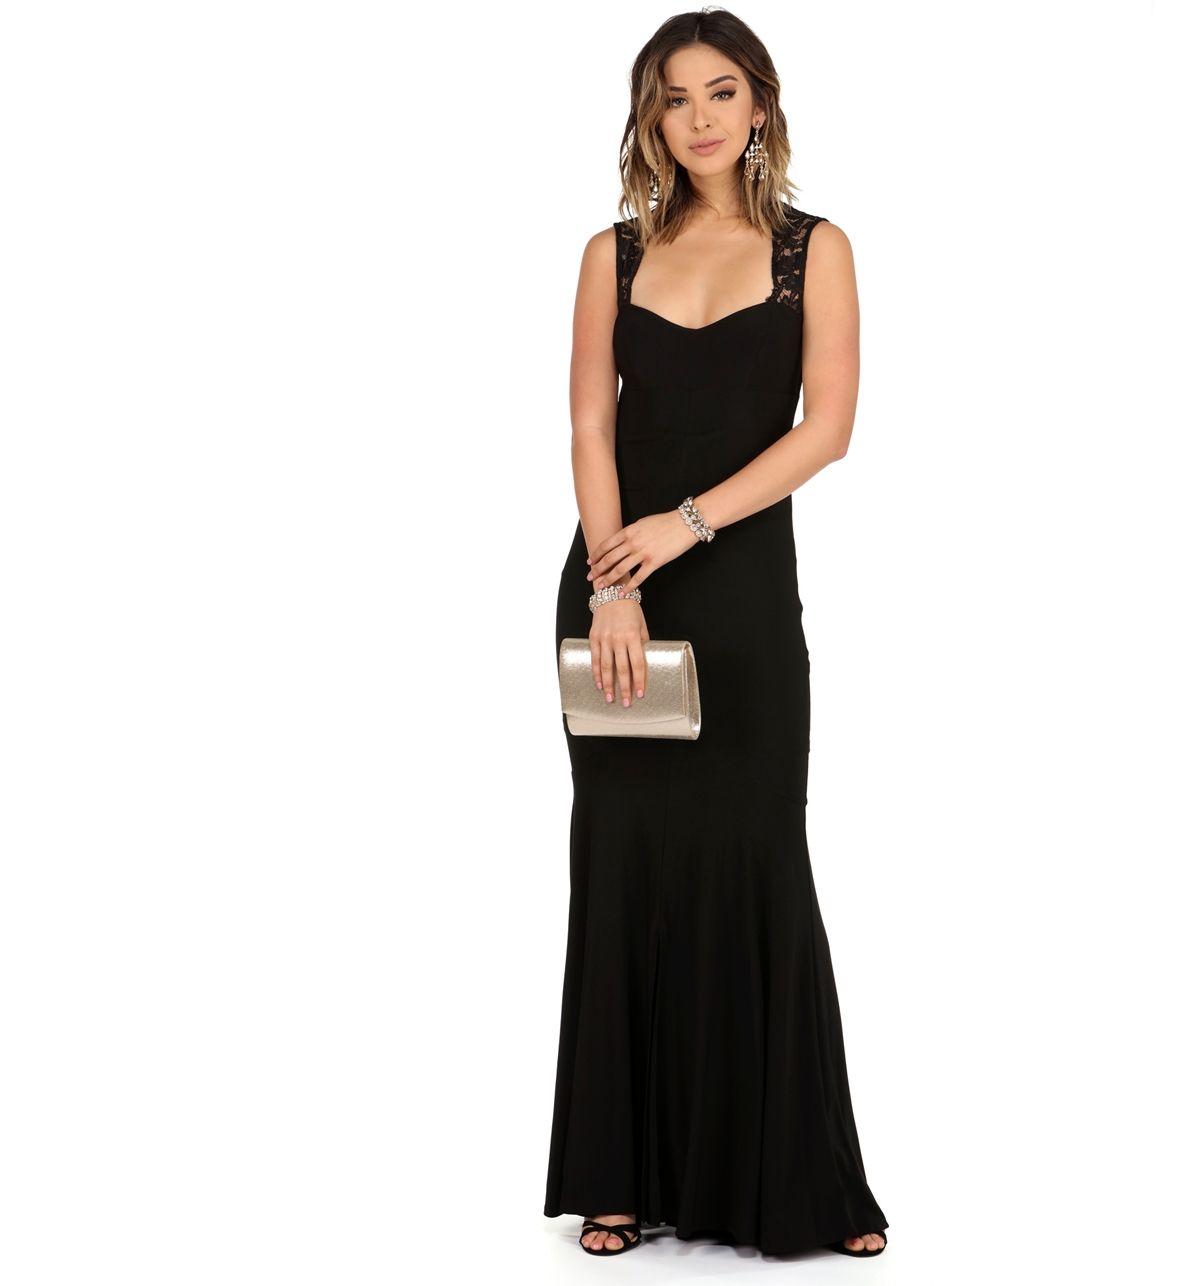 Karla black formal dress black prom dresses formal and prom